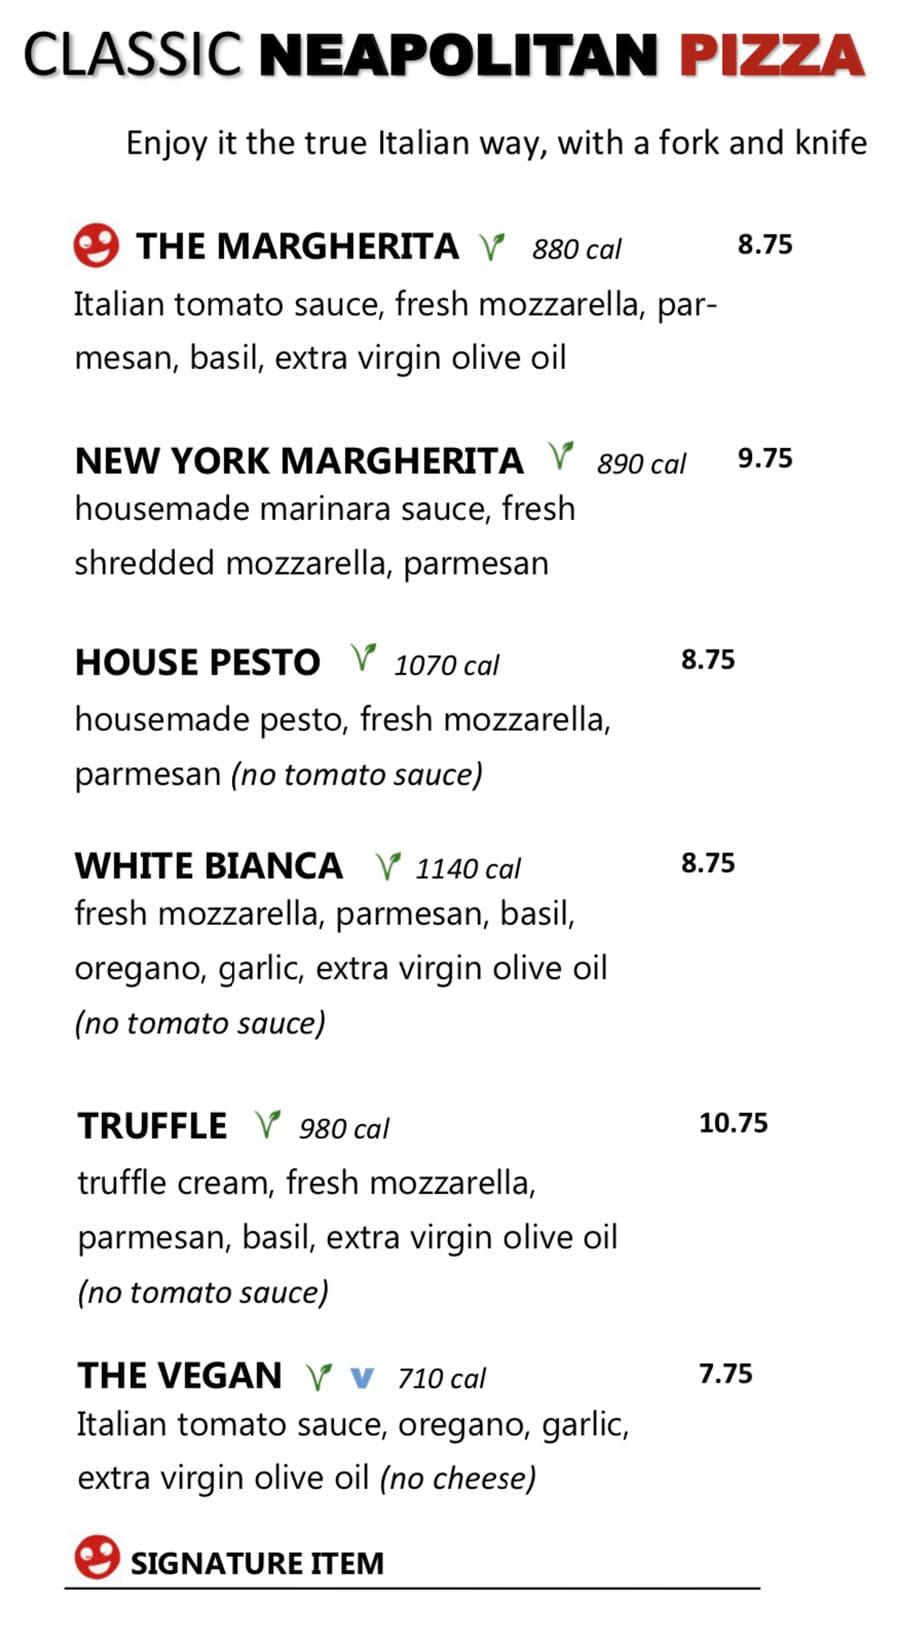 Midici Orem menu - classic neapolitan pizza